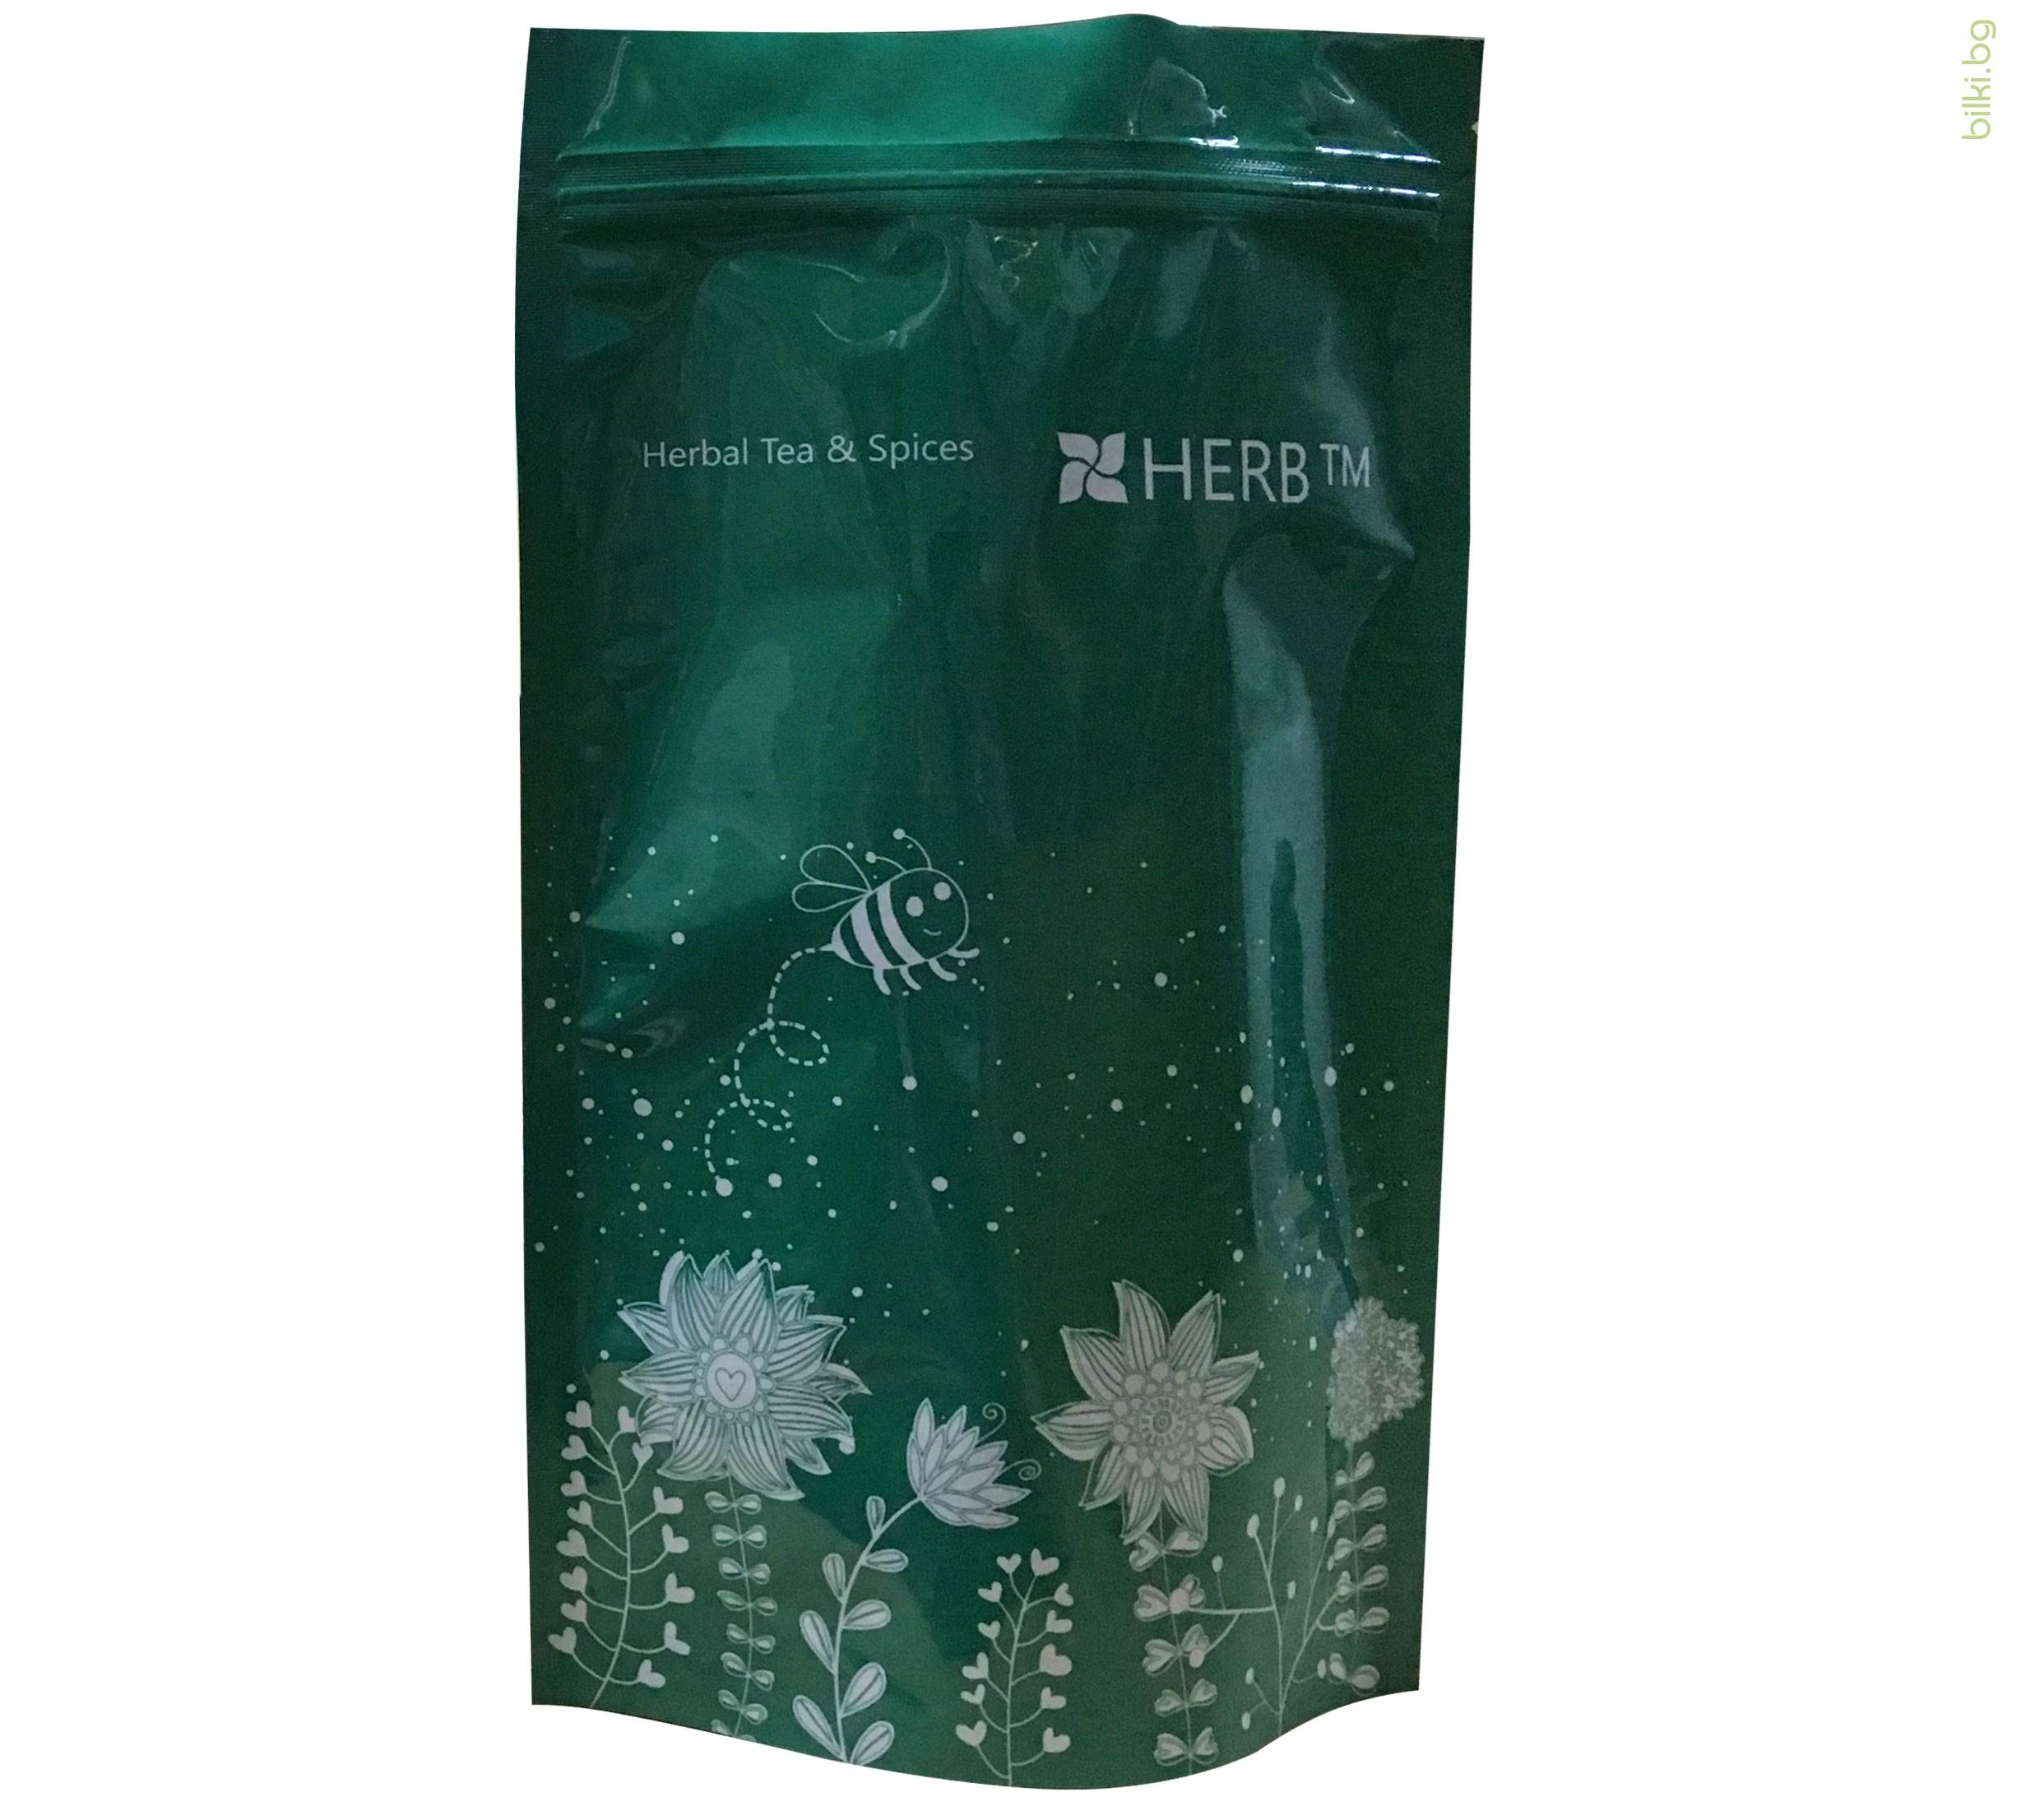 lapacho tea,inkas,лапачо,чай на инките,lapacho herbal tea,health benefits of lapacho tea